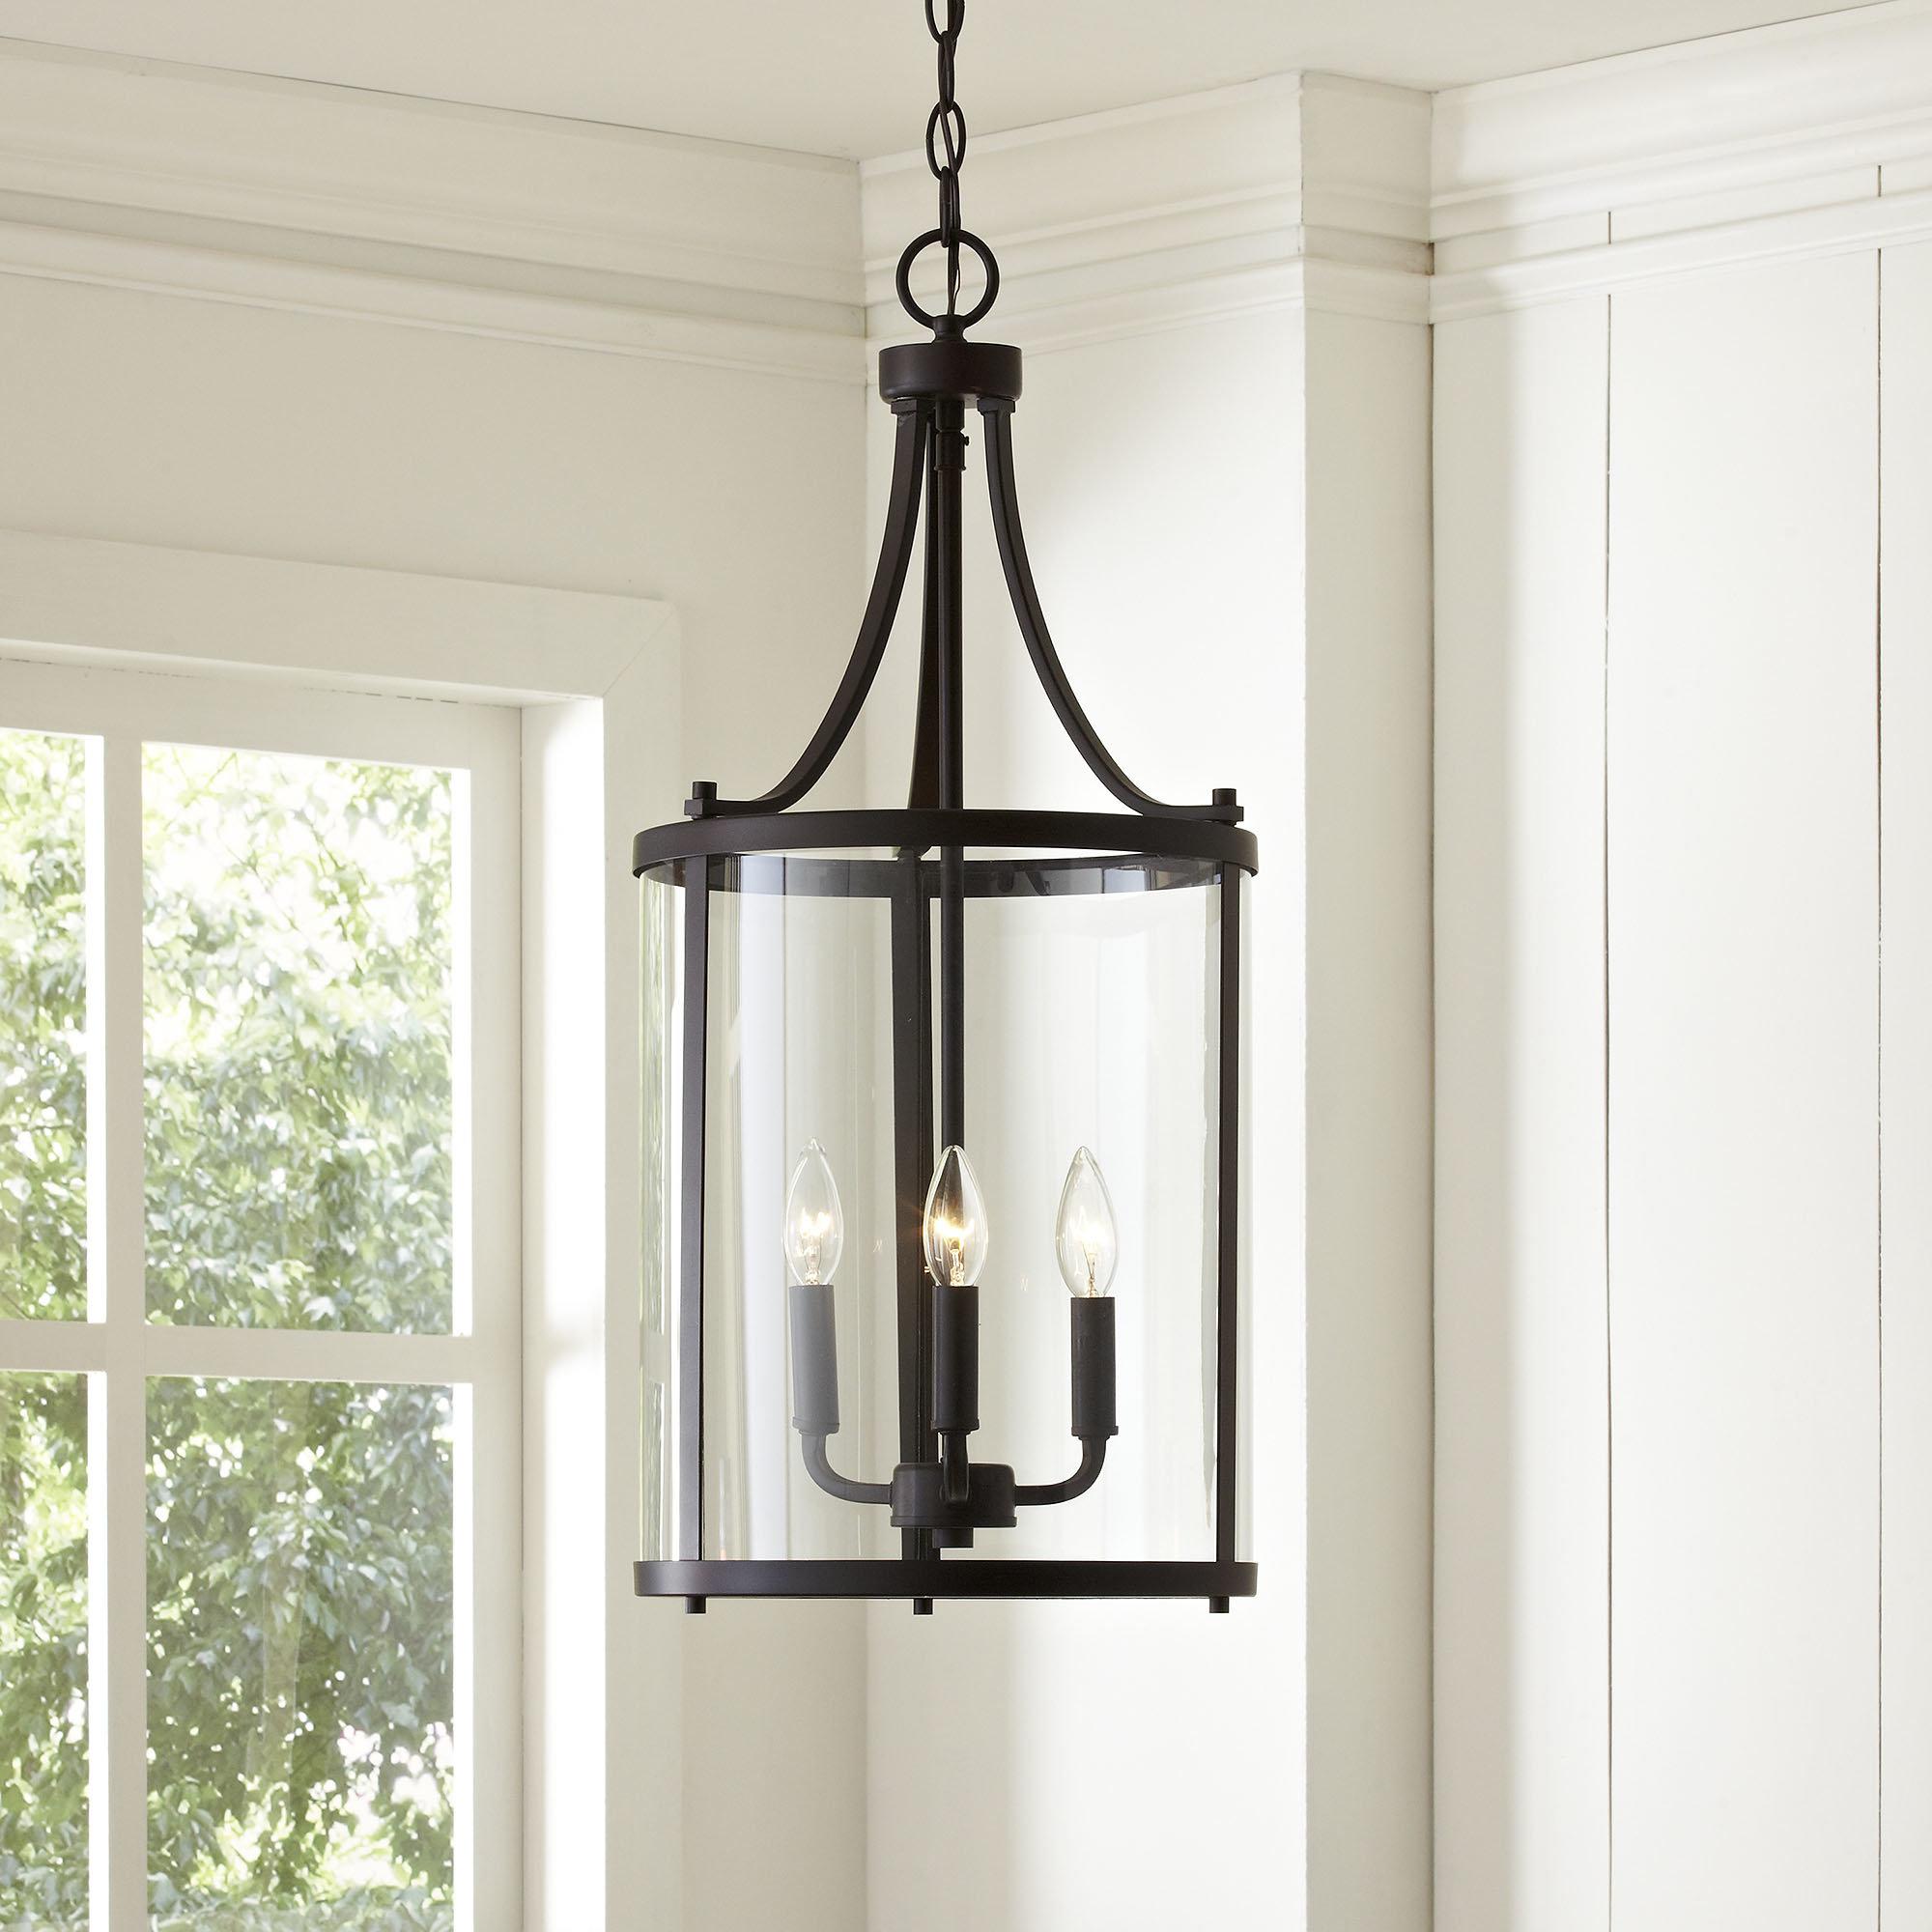 3 Light Lantern Cylinder Pendant Regarding Adcock 3 Light Single Globe Pendants (View 12 of 30)